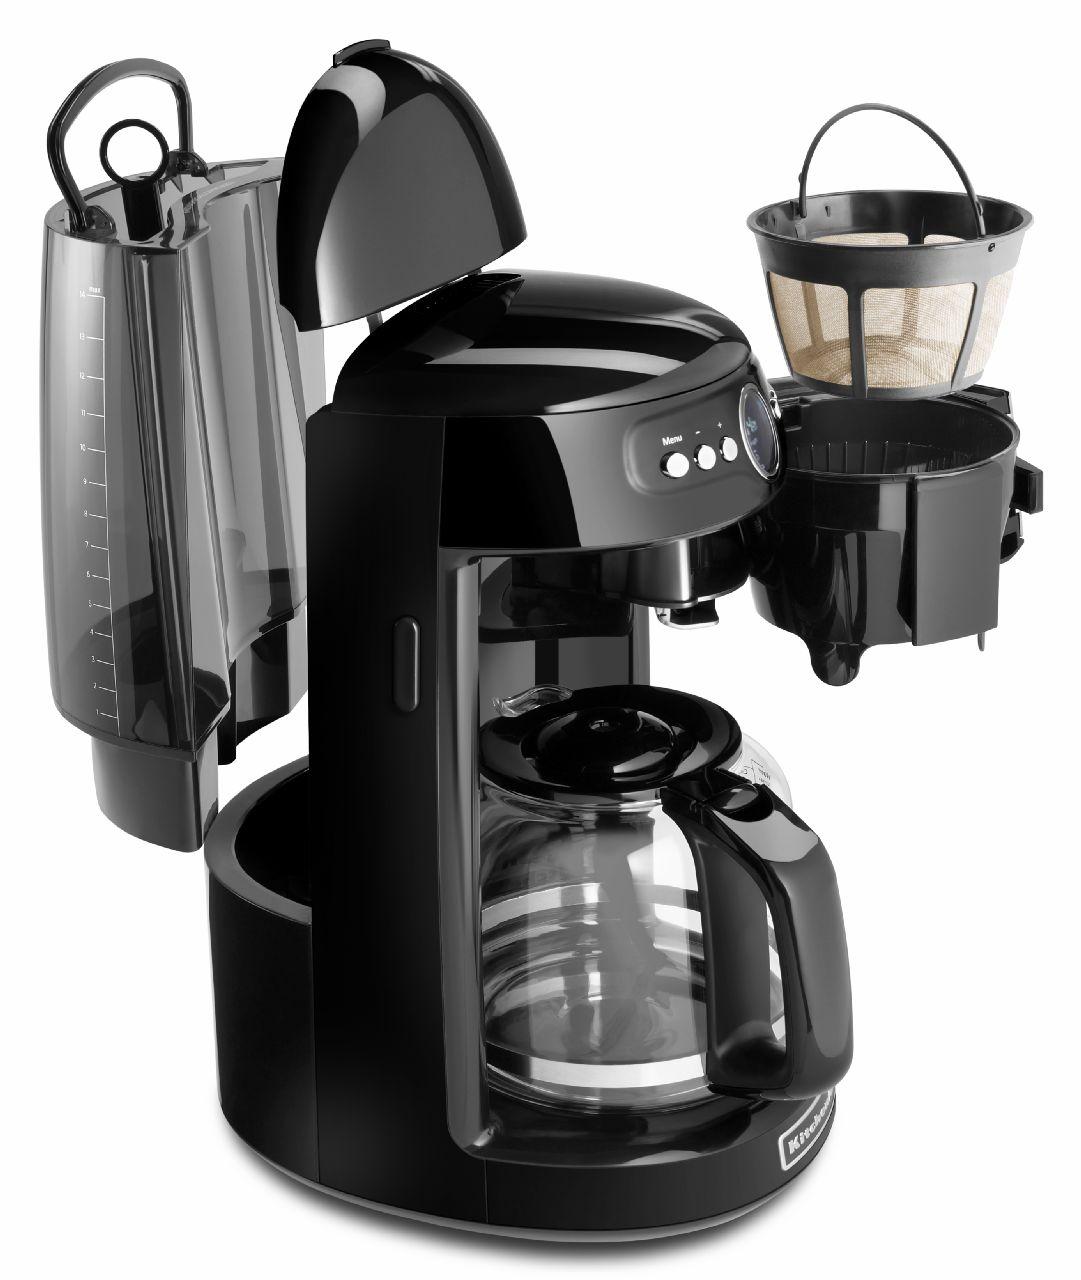 Details about KitchenAid® 12 Cup Coffee Maker, KCM1202